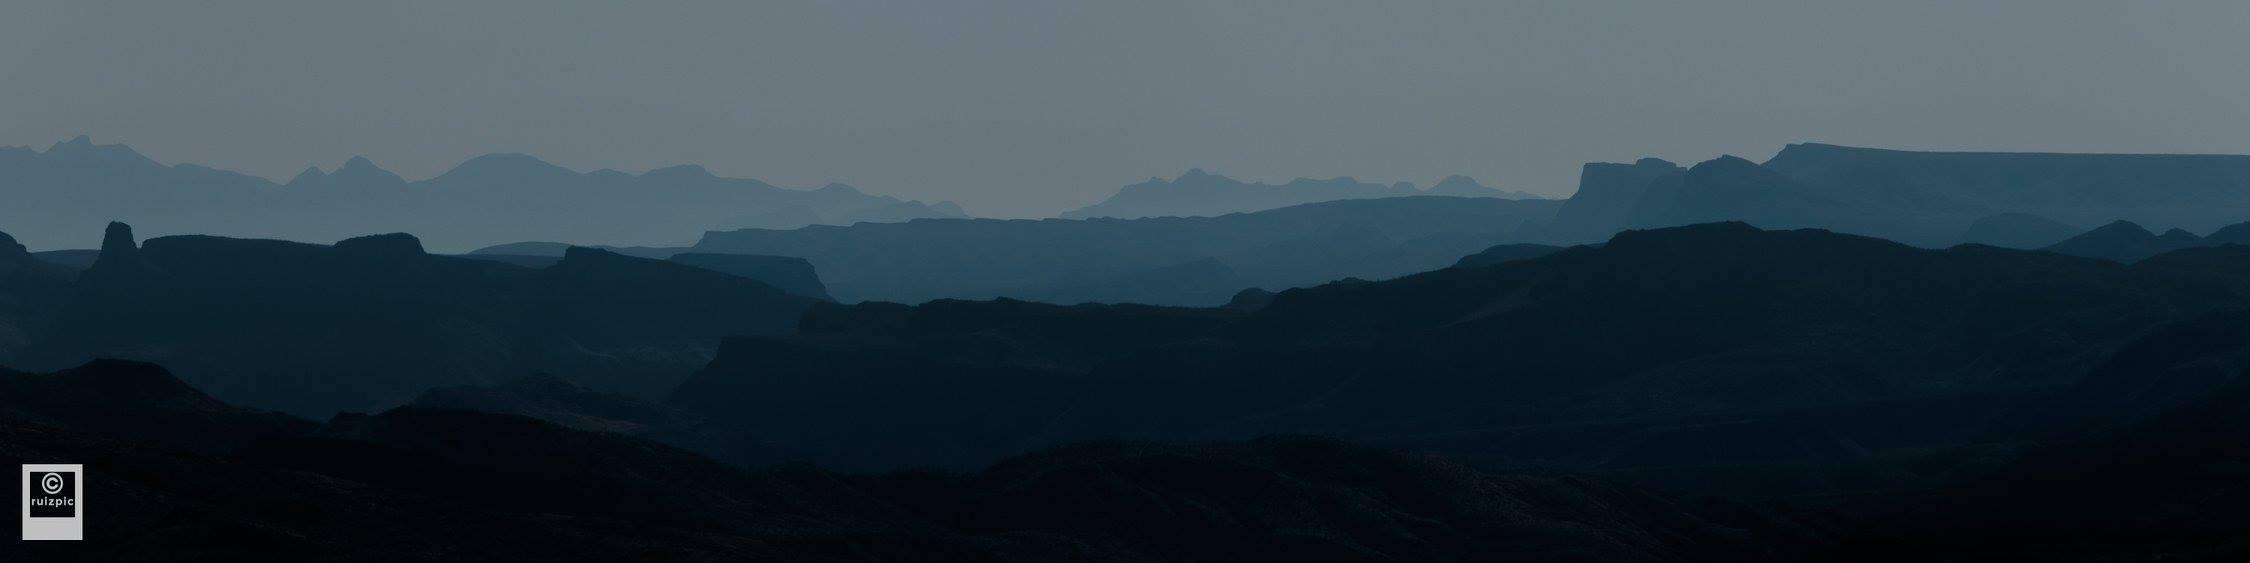 Big Bend Twilight.jpg